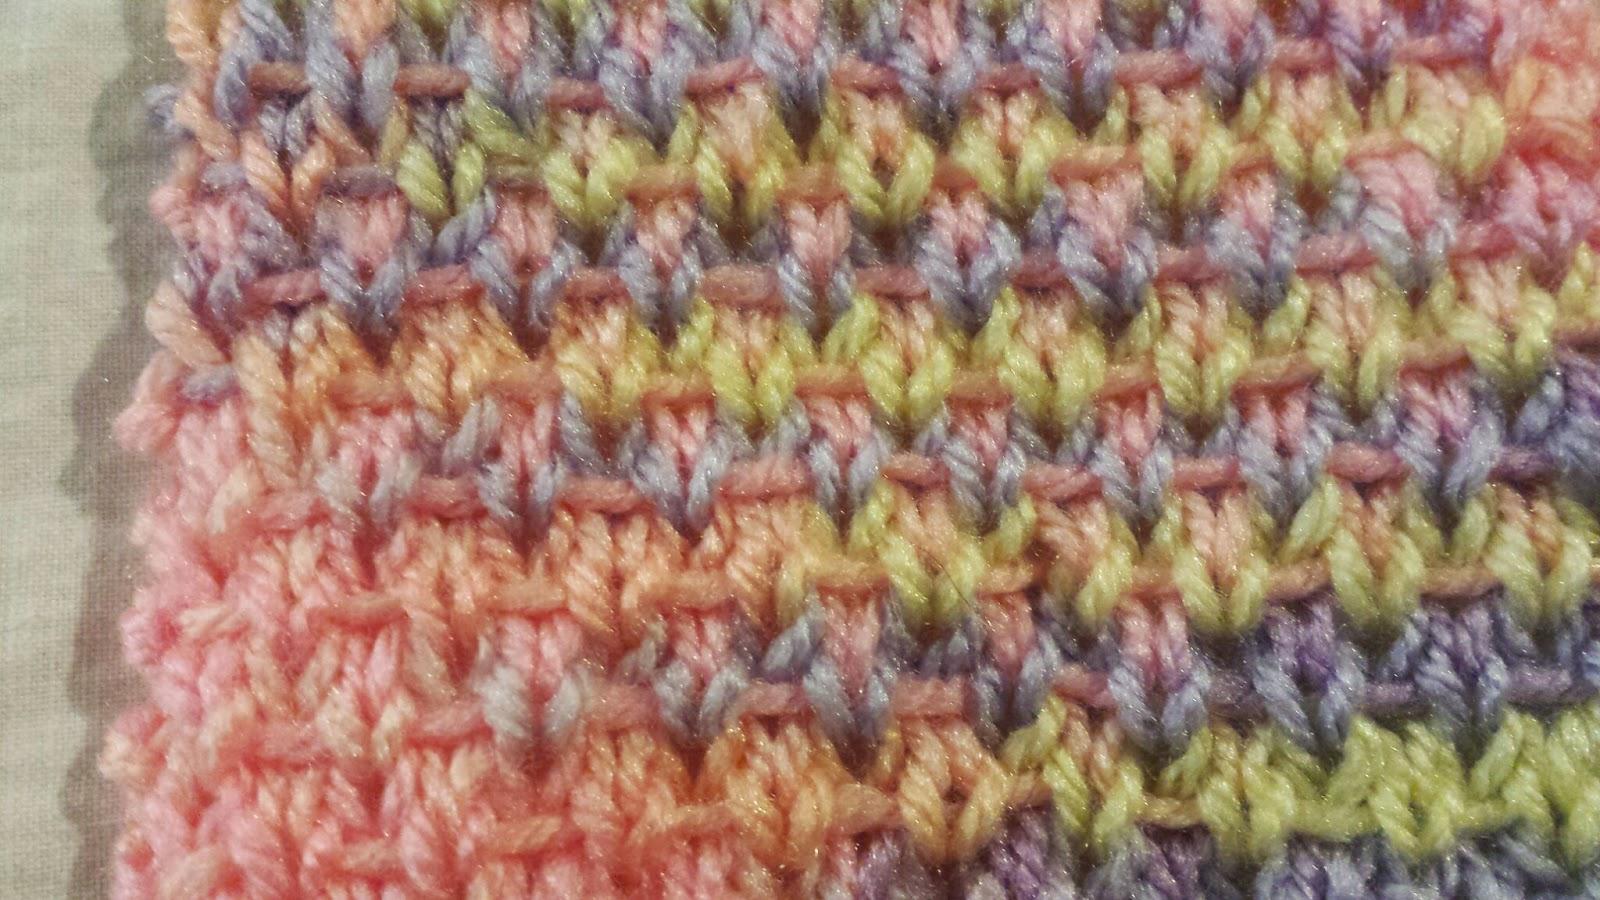 My Patchwork Quilt: TWEED STITCH - A KNIT PATTERN